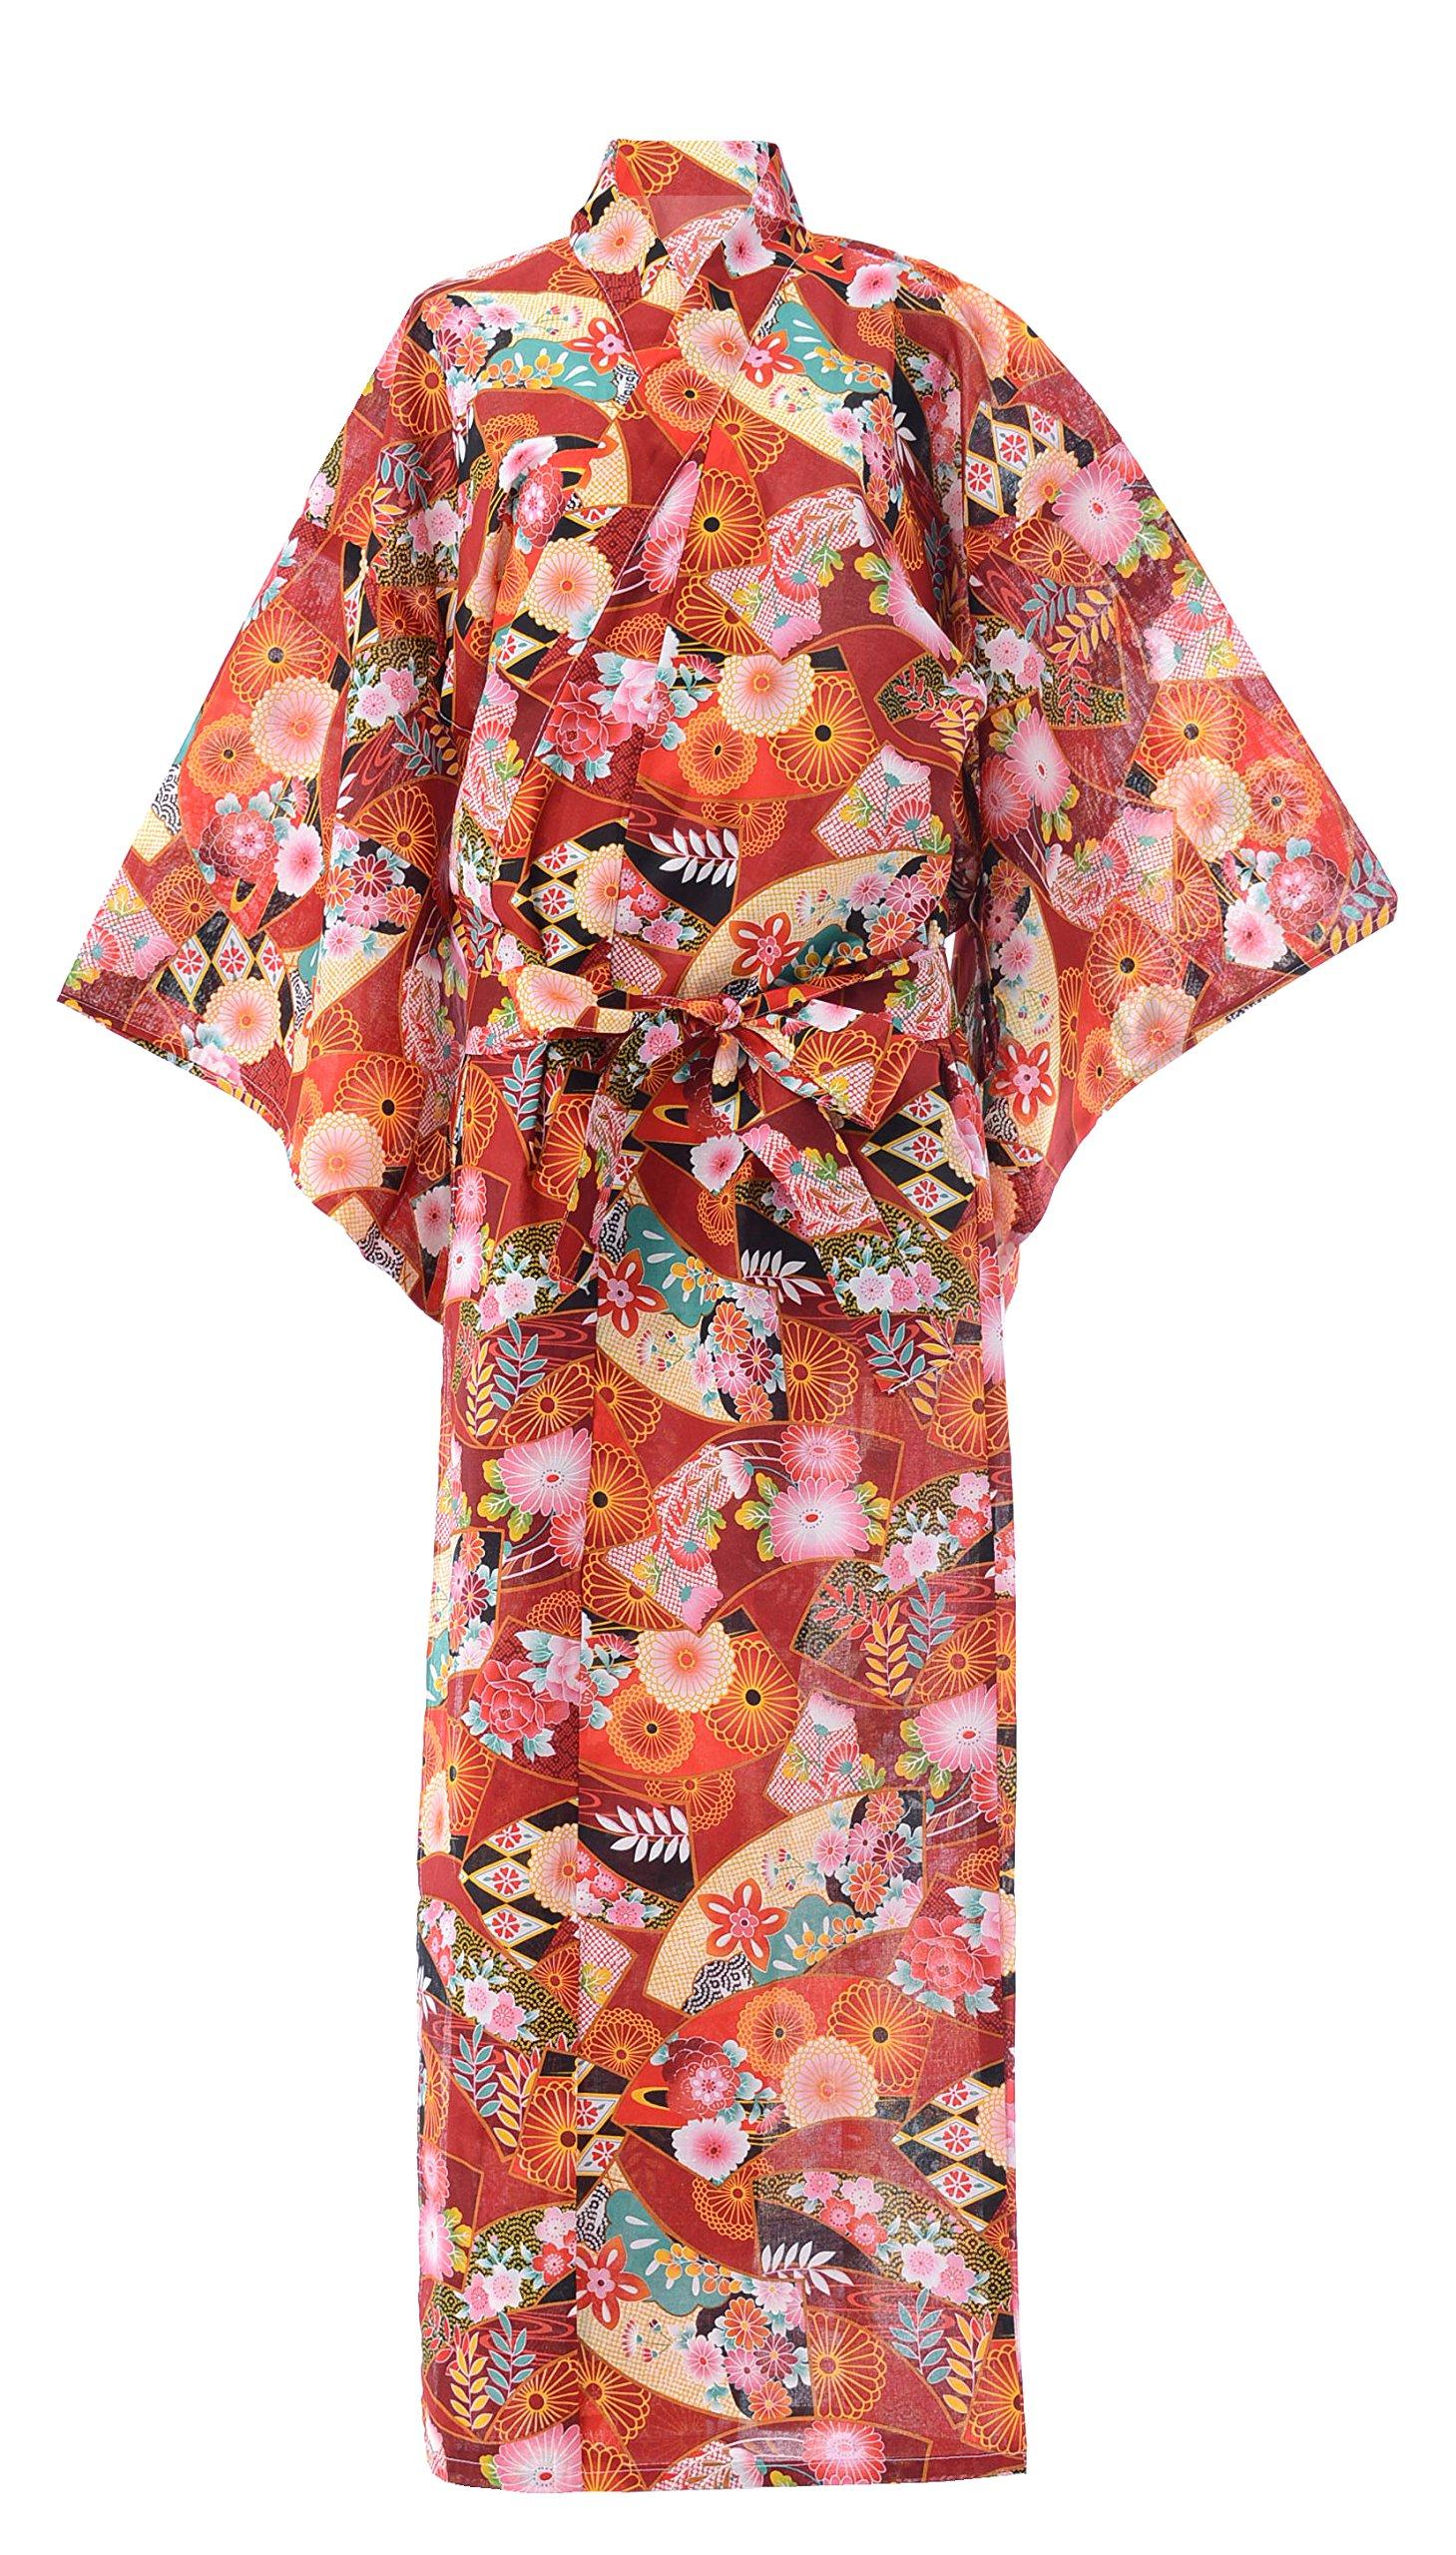 Kimura Jitsugyo Kyoto Traditional Easy Wear Yukata Robe (Japanese Casual Kimono Pajama) Japanese Chrysanthemum Set 2 Large Woman